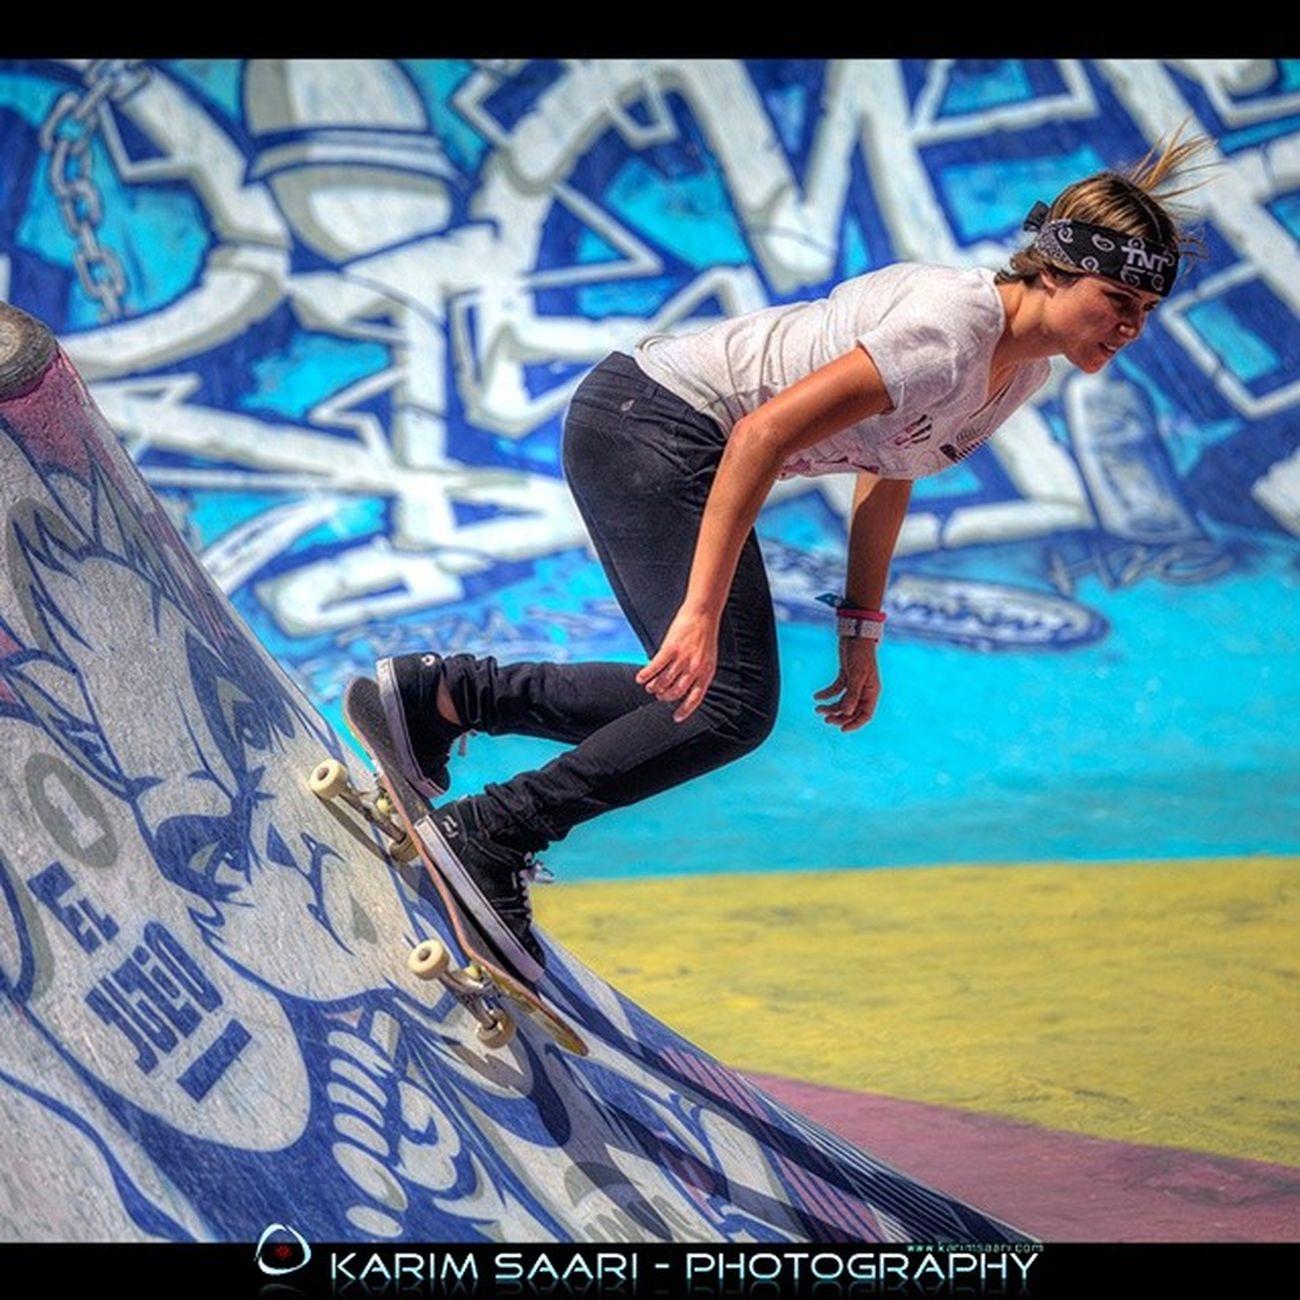 Sosh Freestyle Cup 2013 Skate Skateboard Board Streetphotography street soshfreestylecupisu sosh_fr instaskate grafitti prado internationalskateboardersunion soshfreestylecup bsm bowl bowldemarseille isu marseillerebelle marseille igersfrance igersmarseille